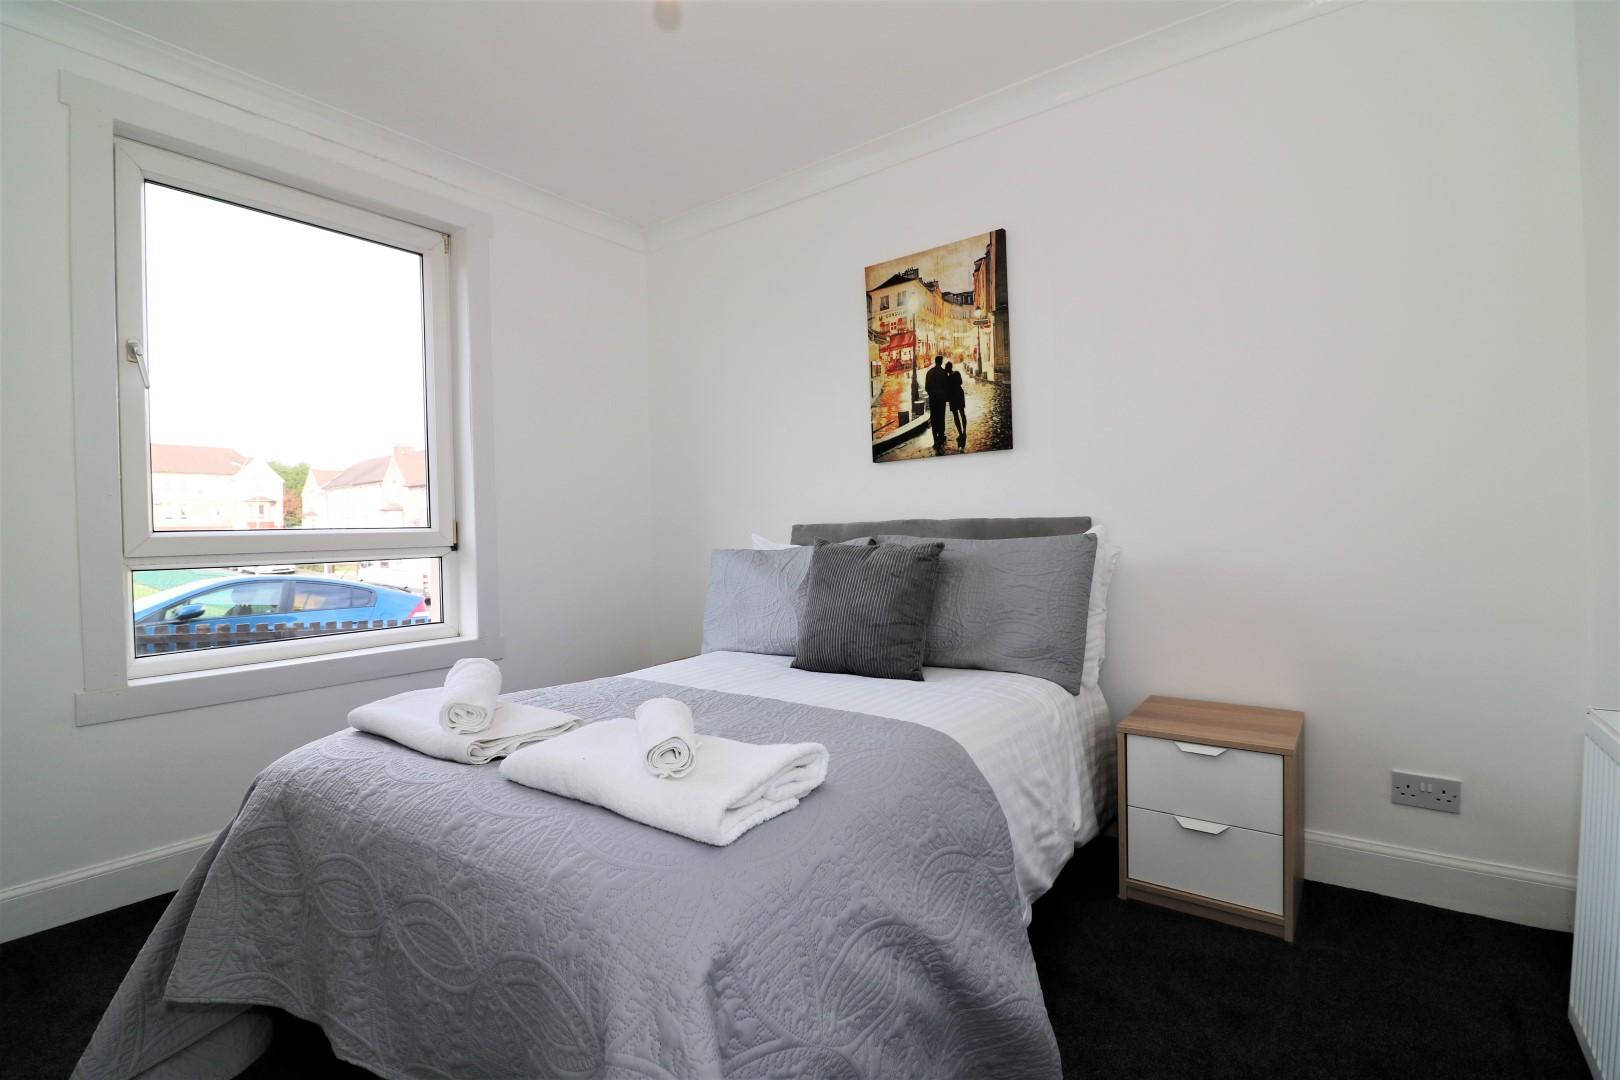 Cosy bedroom at Gartlea House - Citybase Apartments